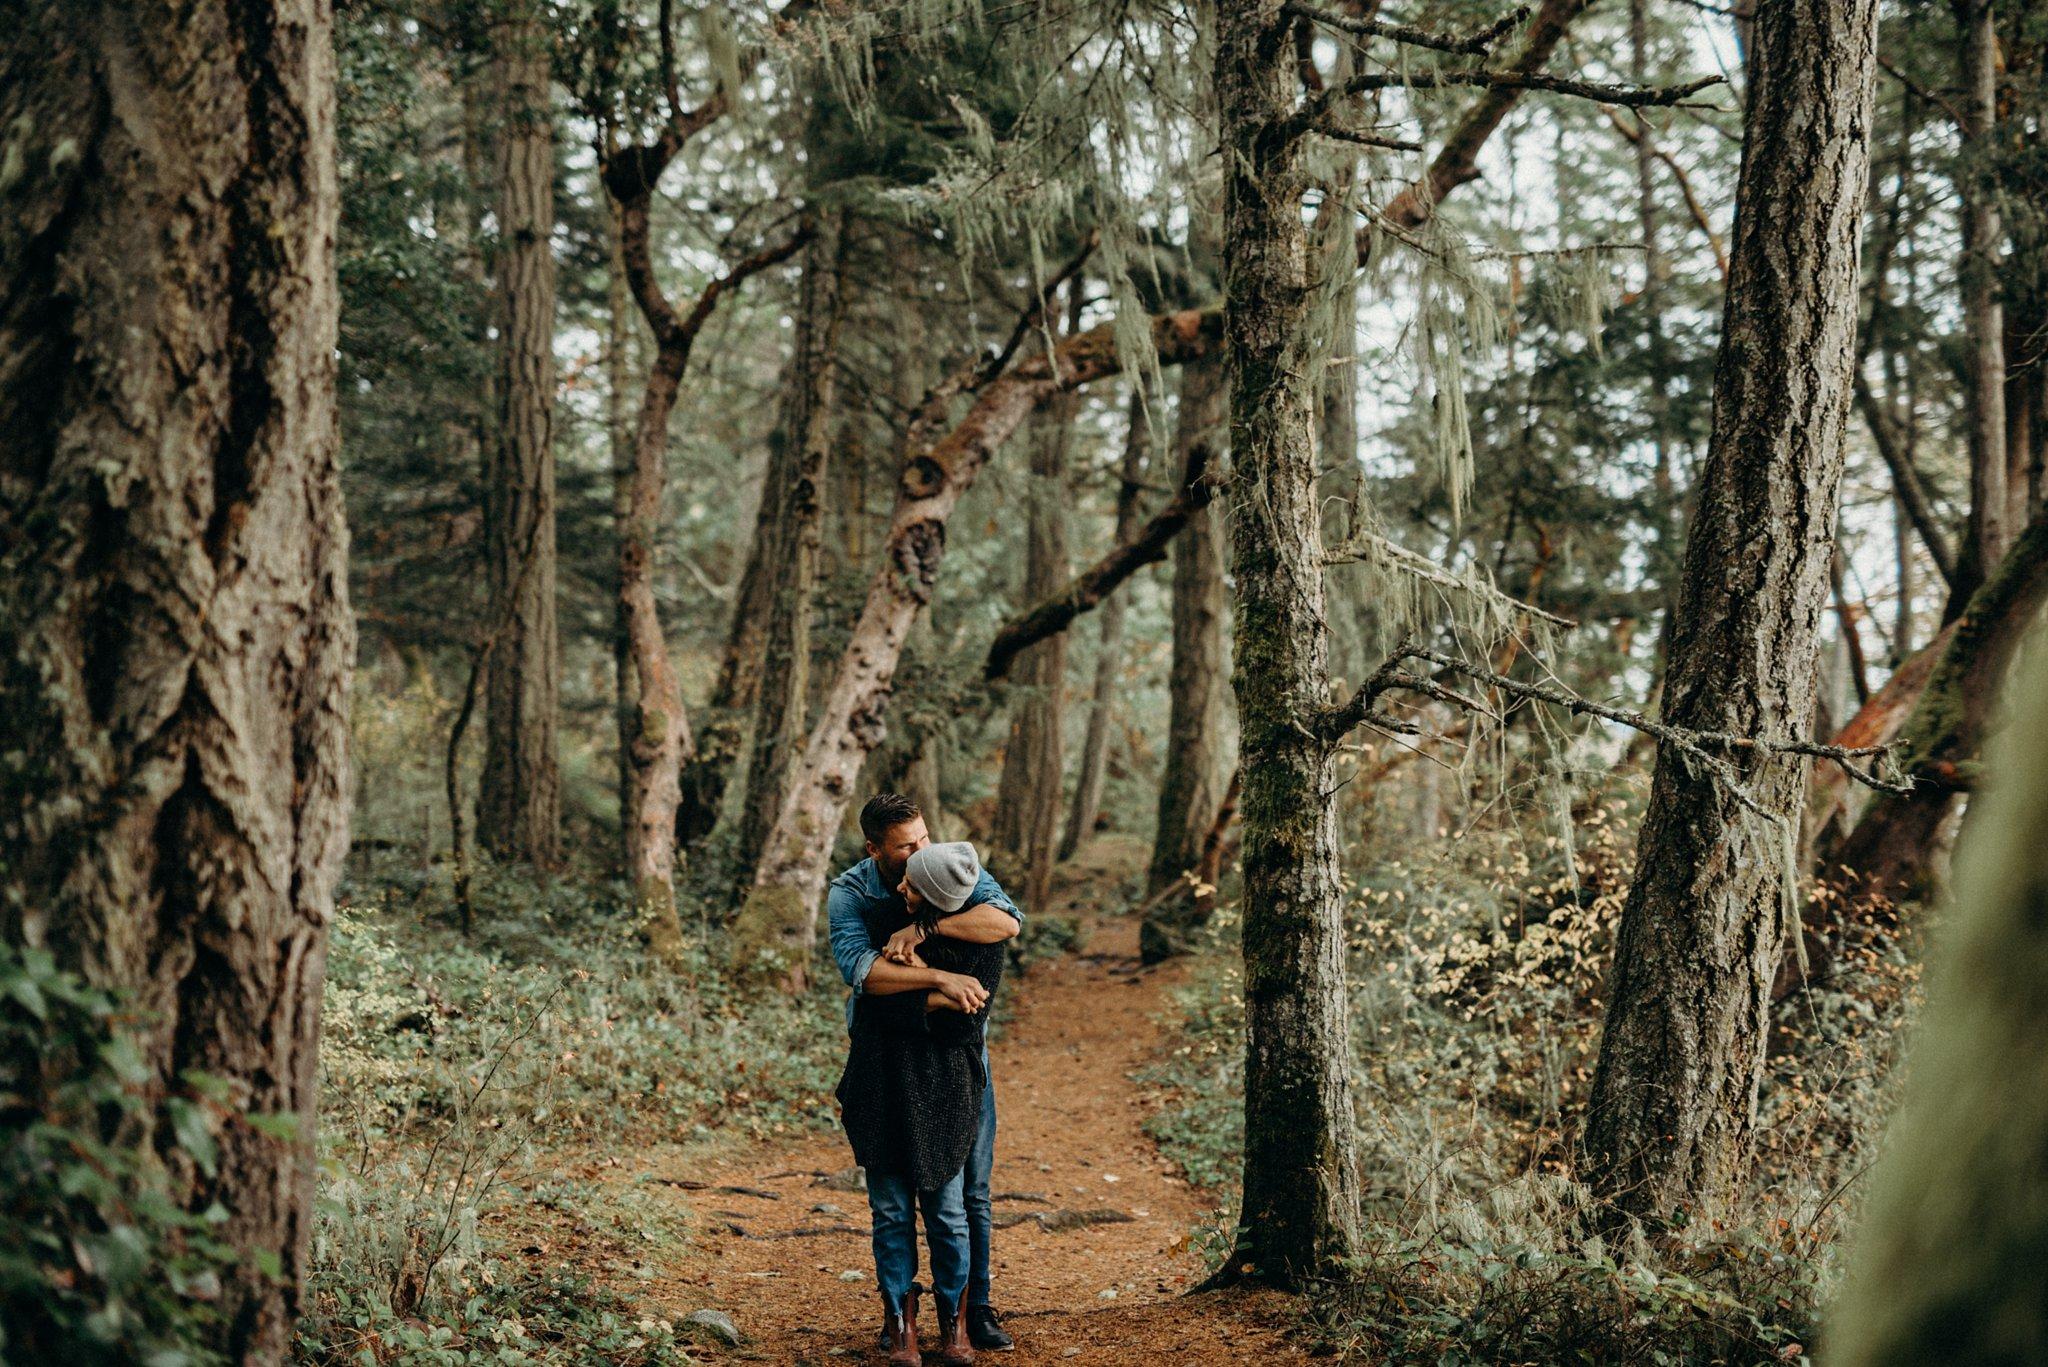 kaihla_tonai_intimate_wedding_elopement_photographer_7098.jpg